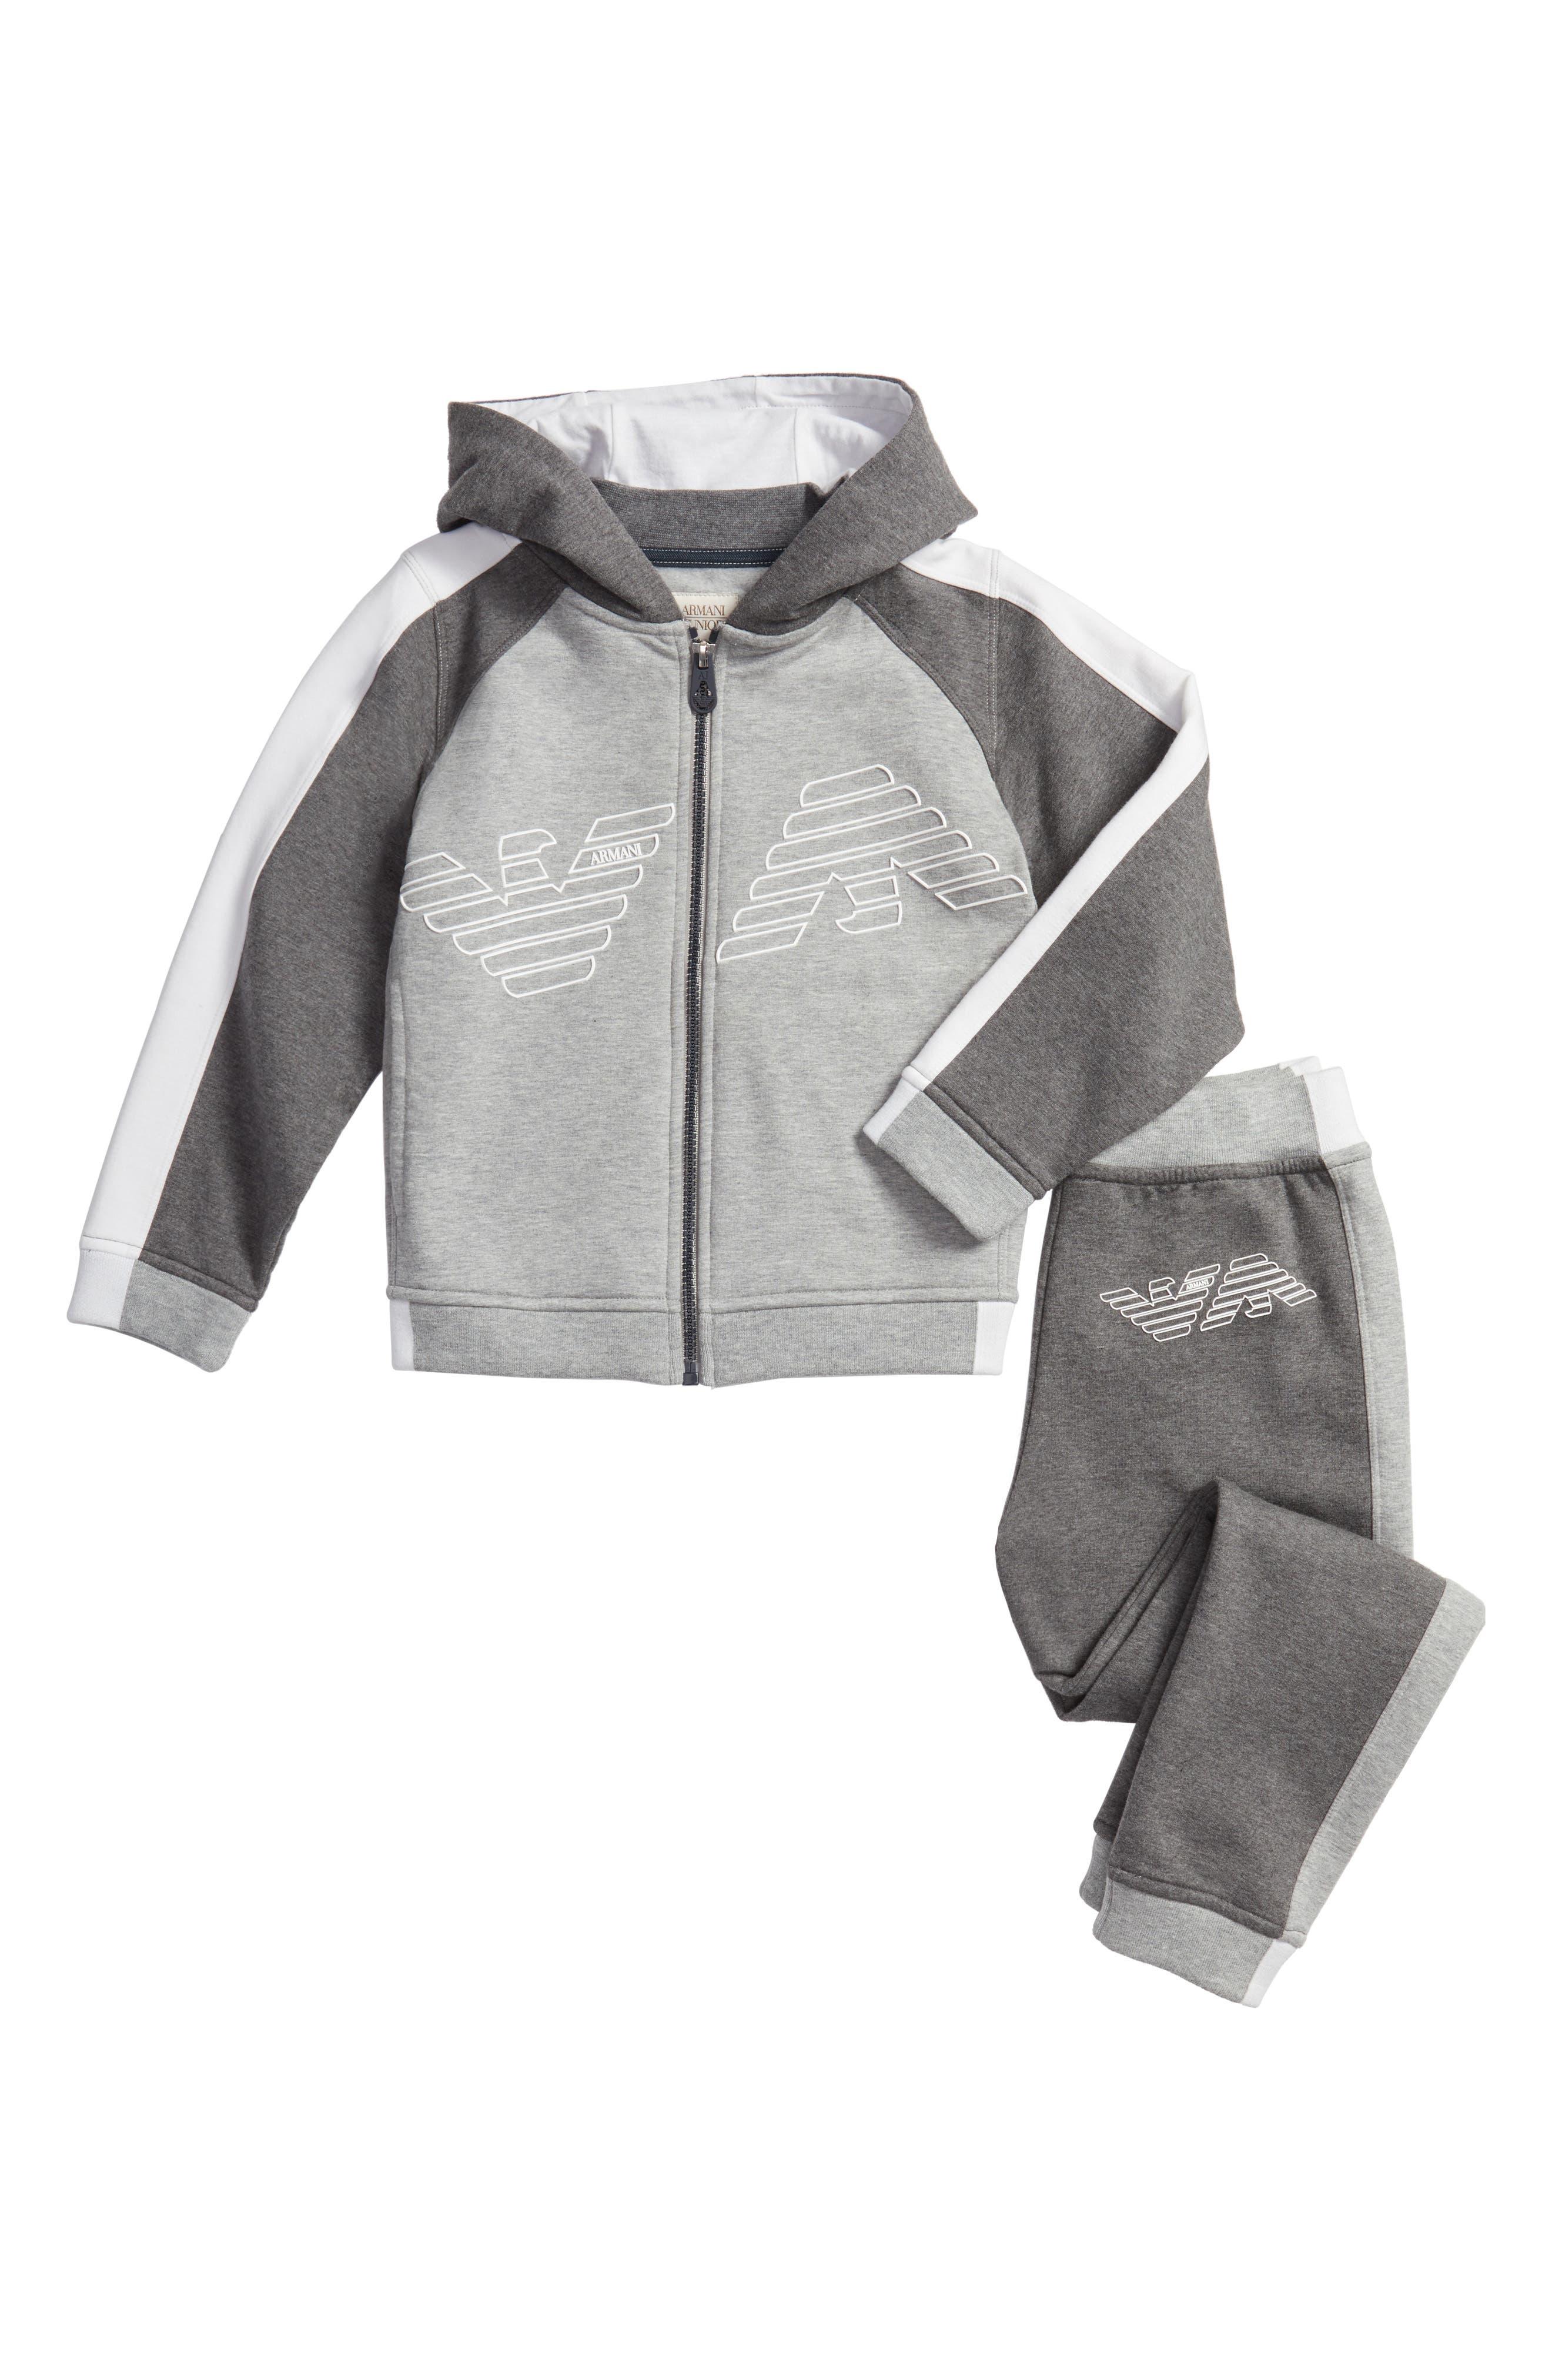 Alternate Image 1 Selected - Armani Junior Hooded Jacket & Sweatpants Set (Little Boys & Big Boys)